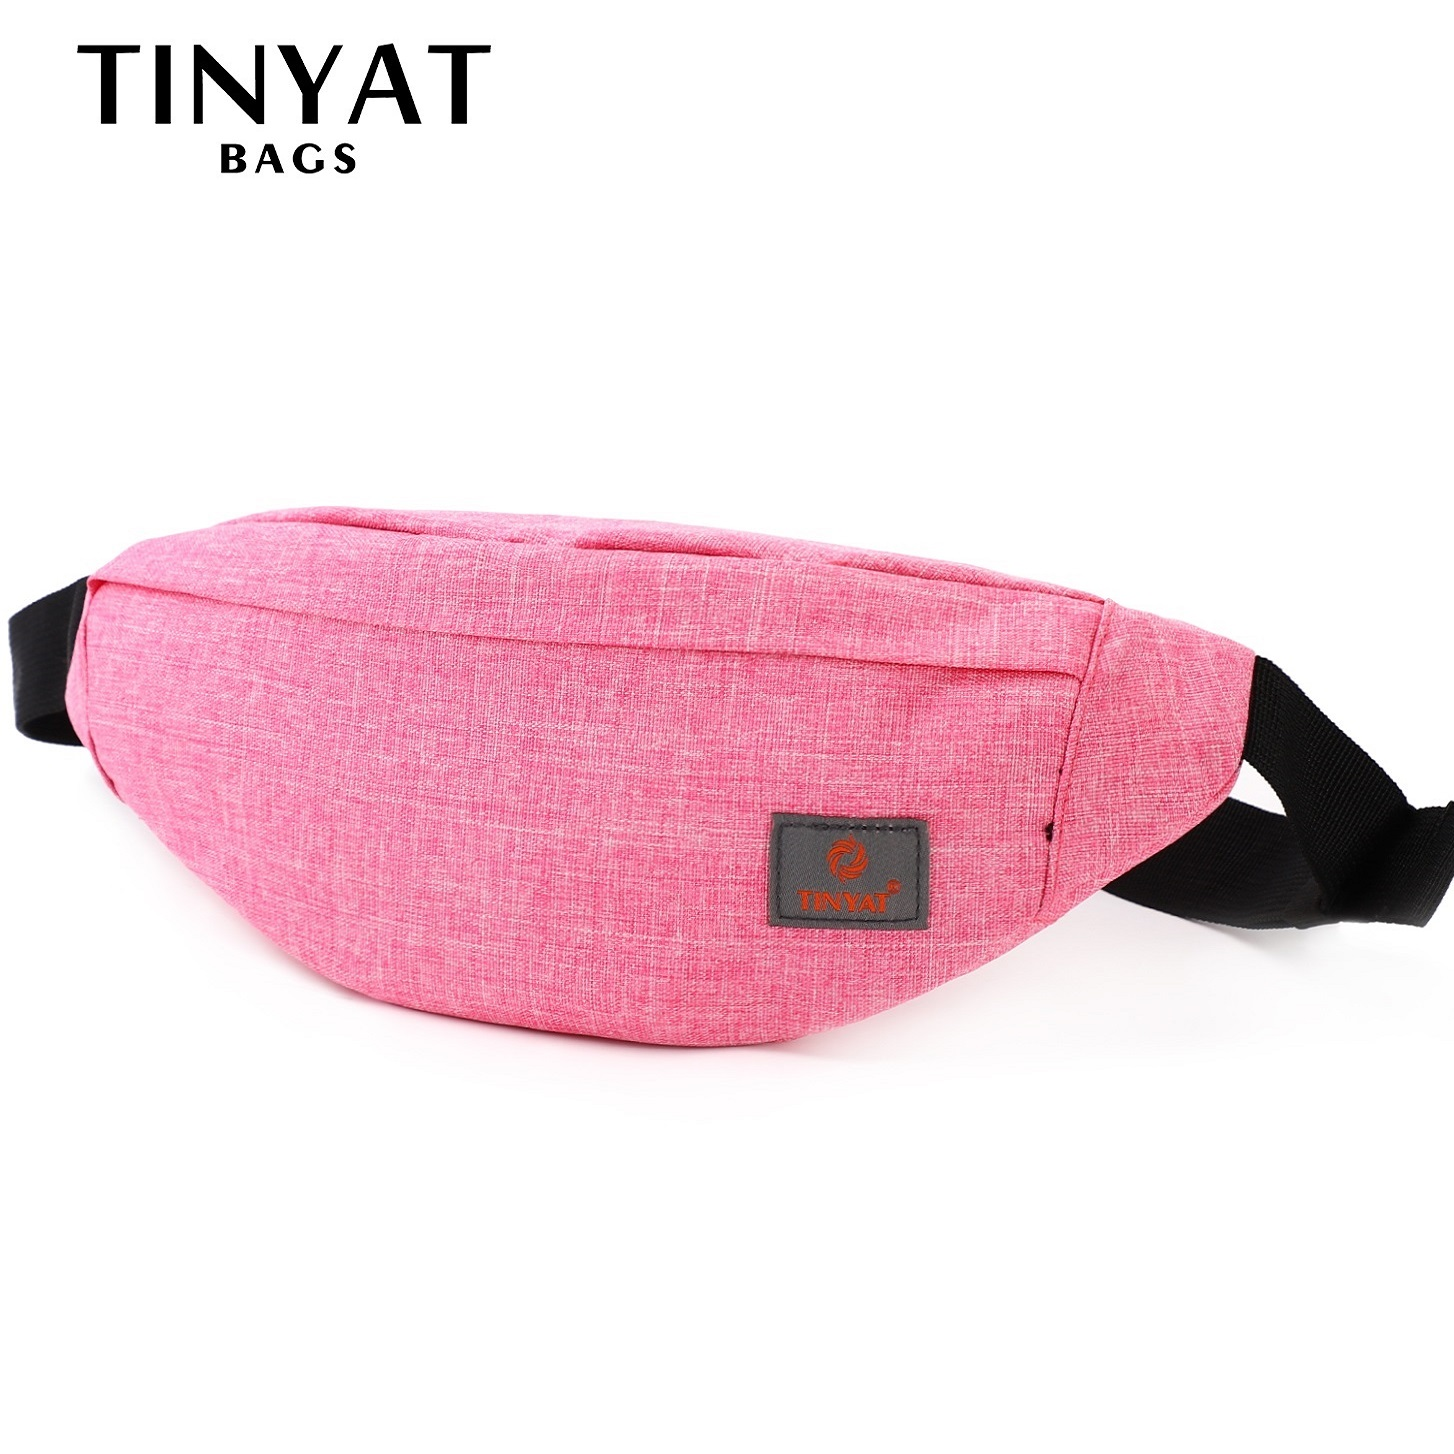 TINYAT Women Waist Bag Female Belt Bag Pack Girl Canvas Casual Fanny Pack Phone Mobile Money Fanny Bag Belt Bags Red